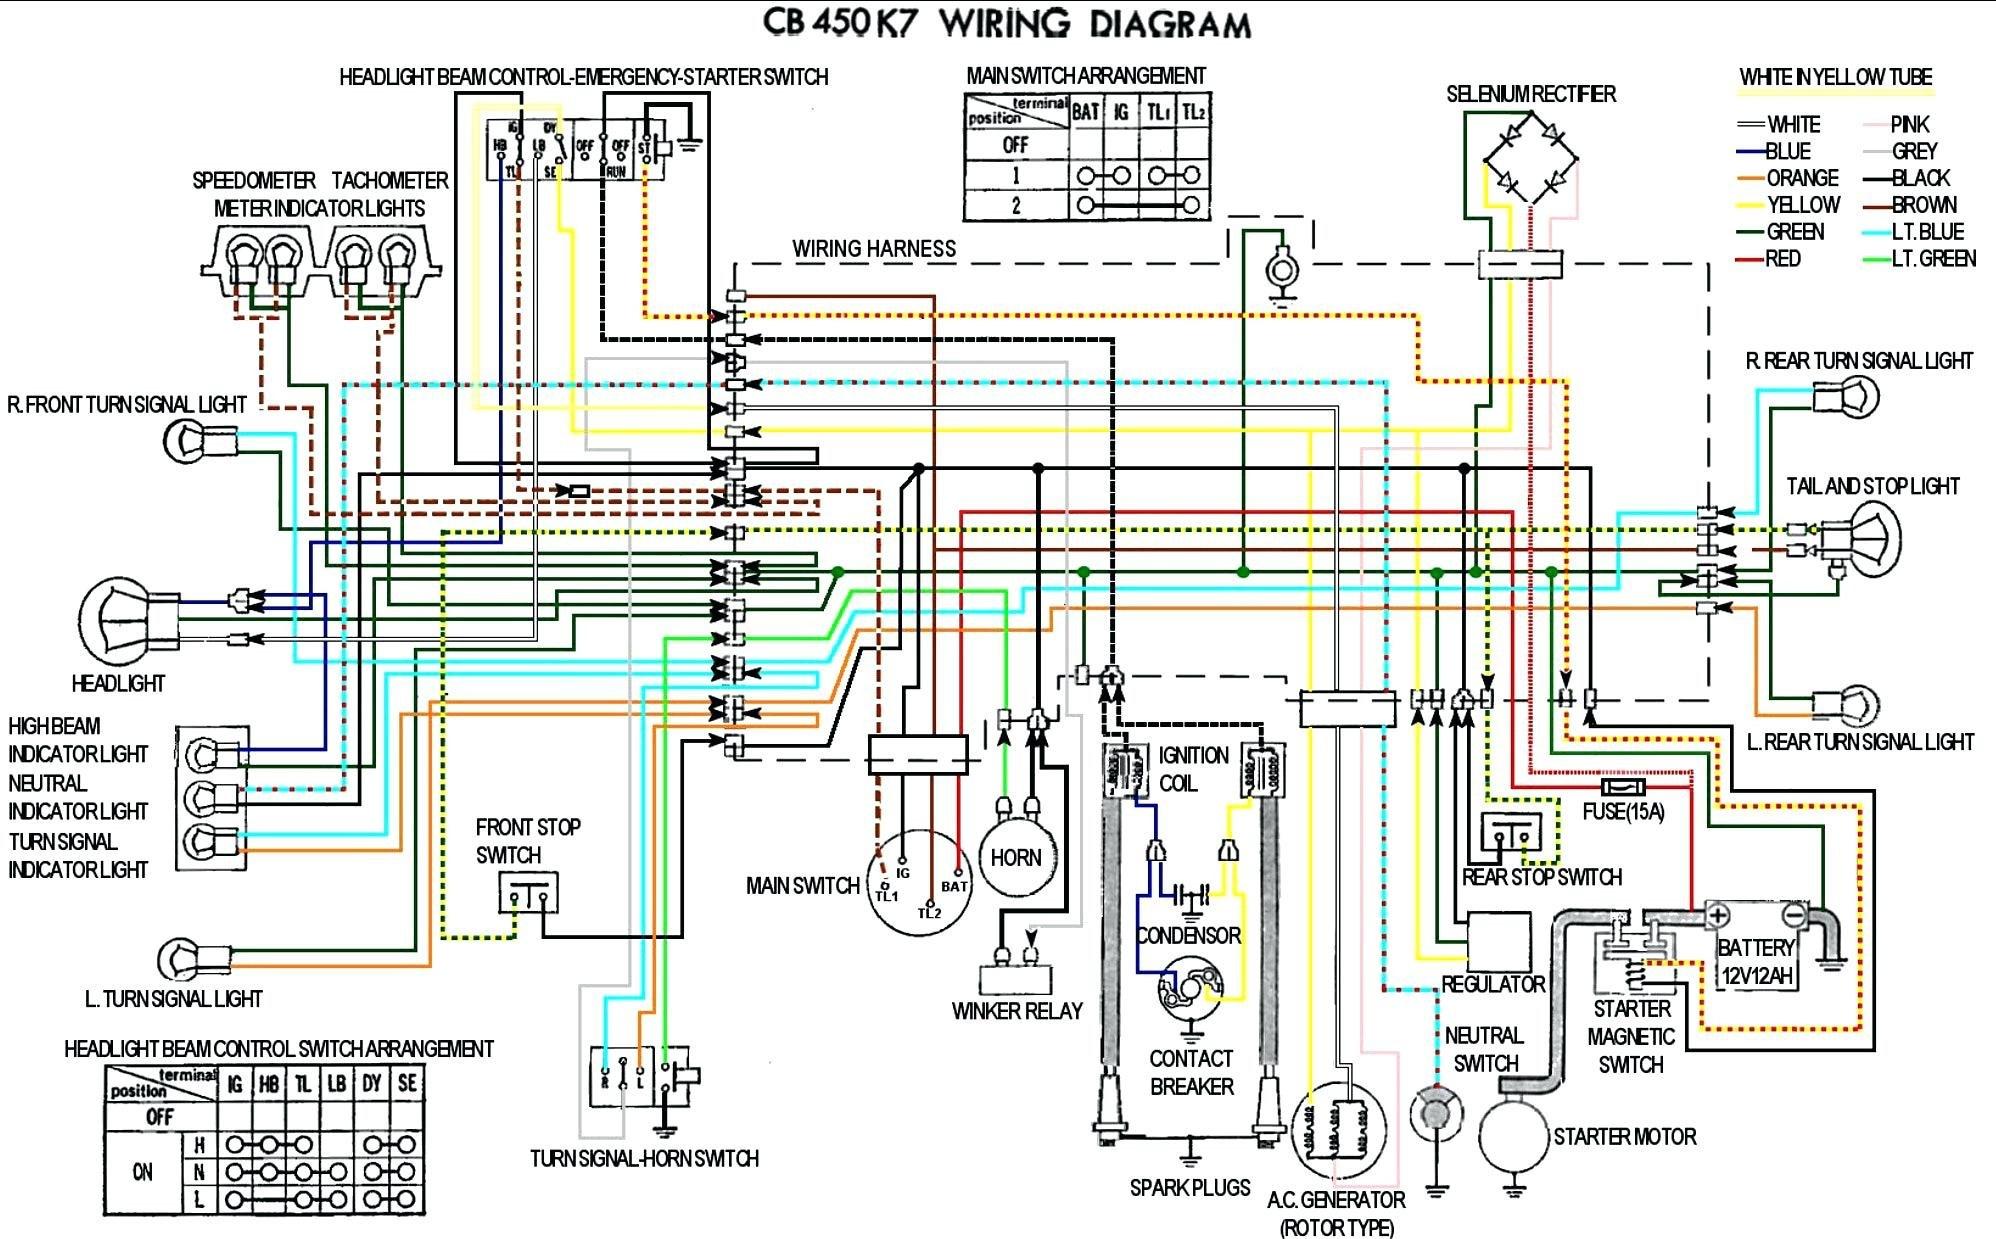 Wondrous Wiring Diagram For John Deere Lt155 Manual E Books John Deere Wiring 101 Ariotwise Assnl